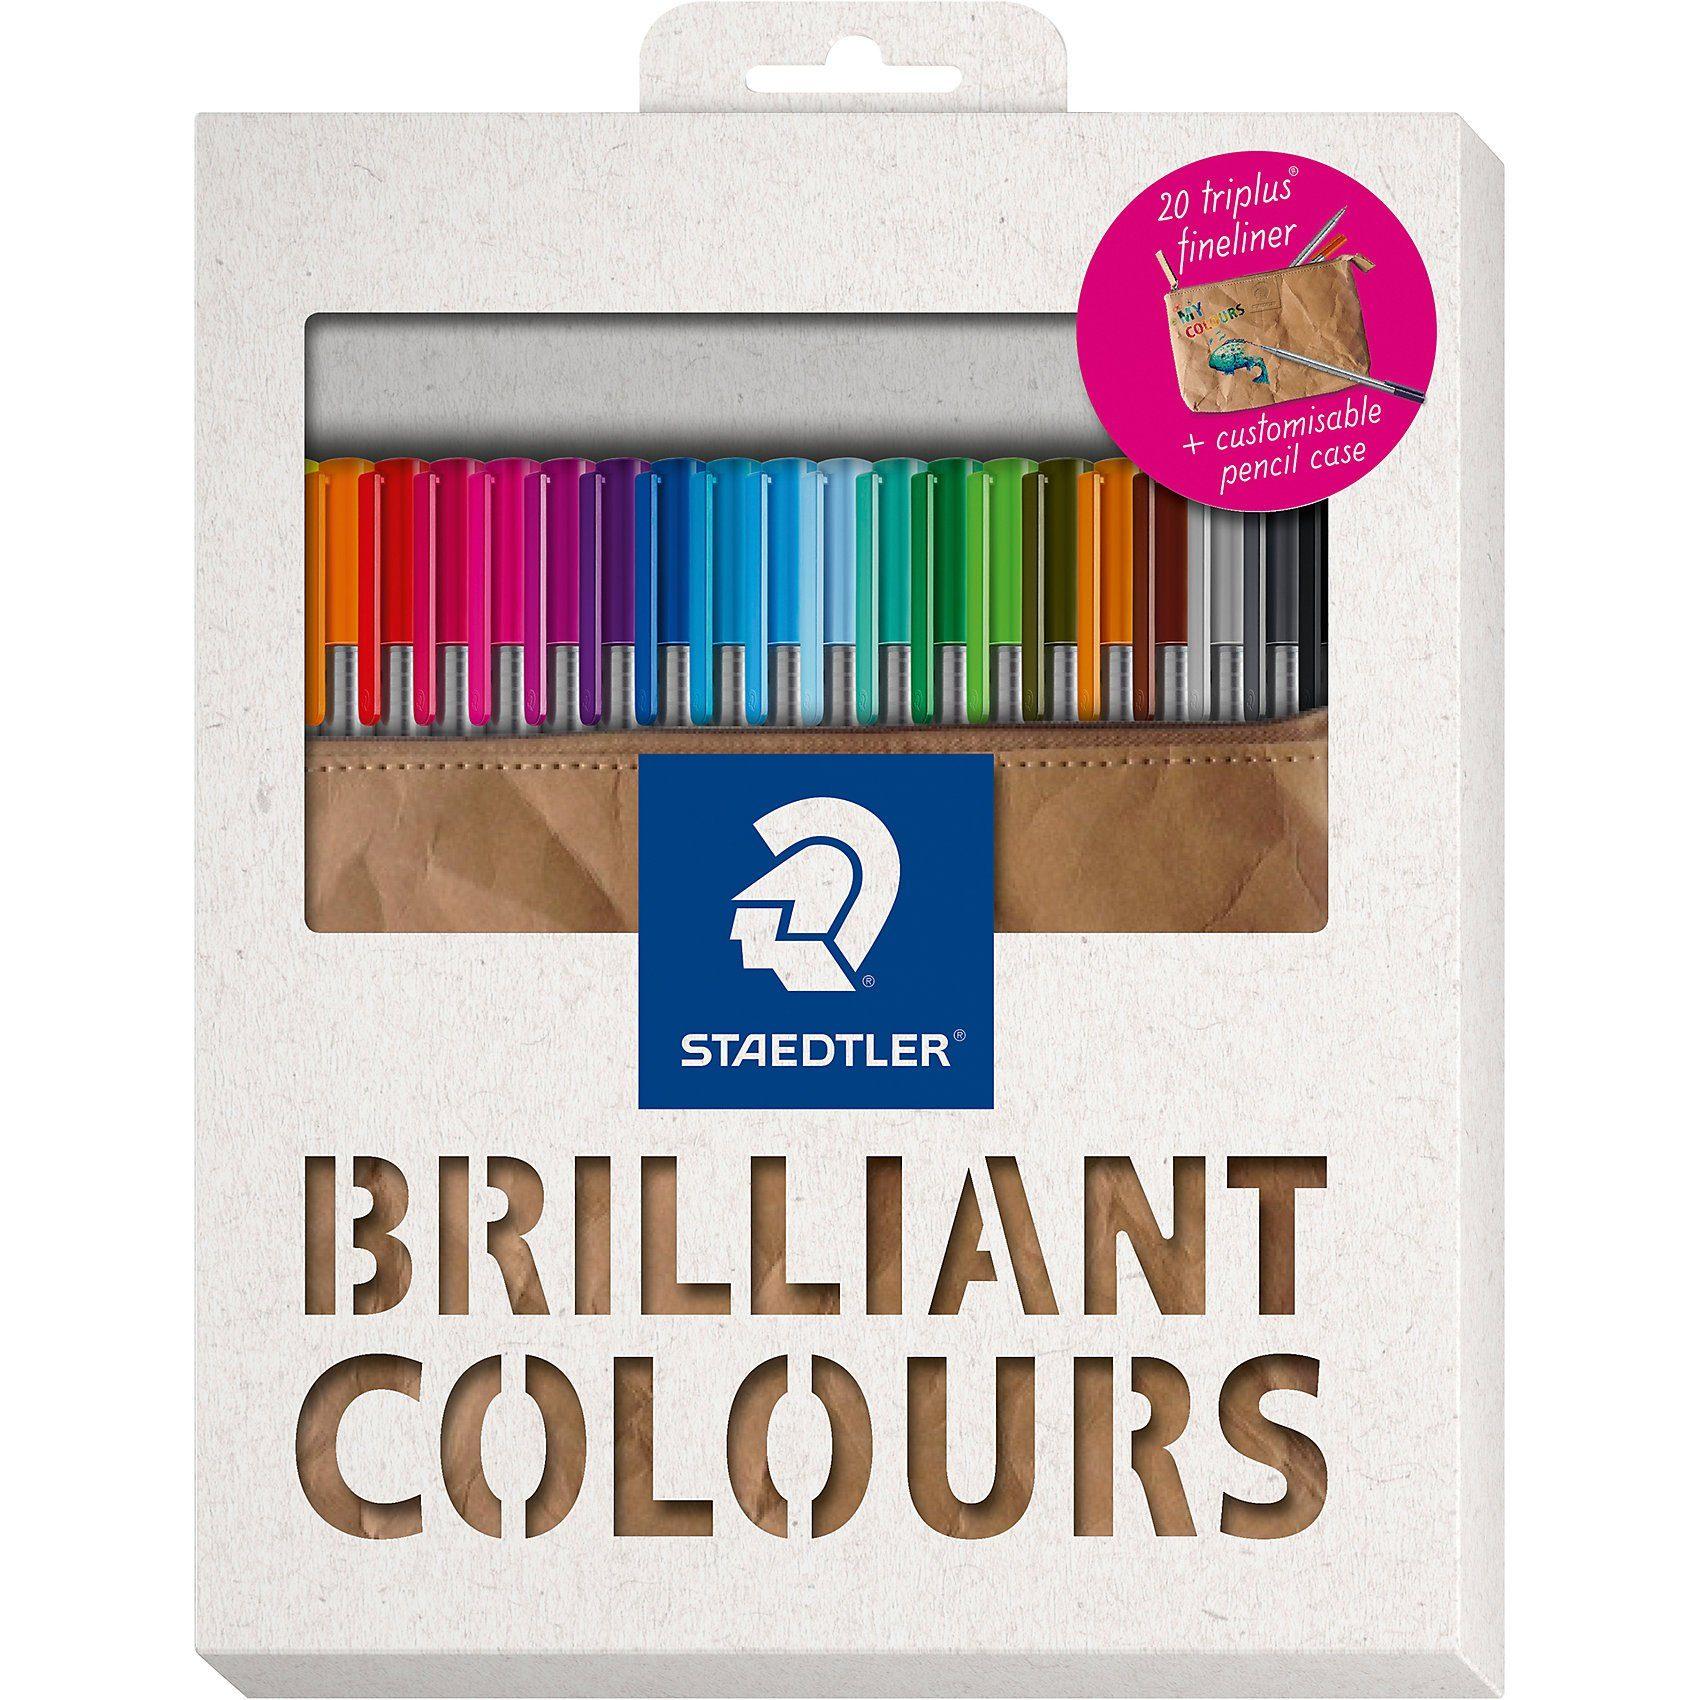 STAEDTLER Fineliner triplus Pencil Case Collection 2018, 20 Farben